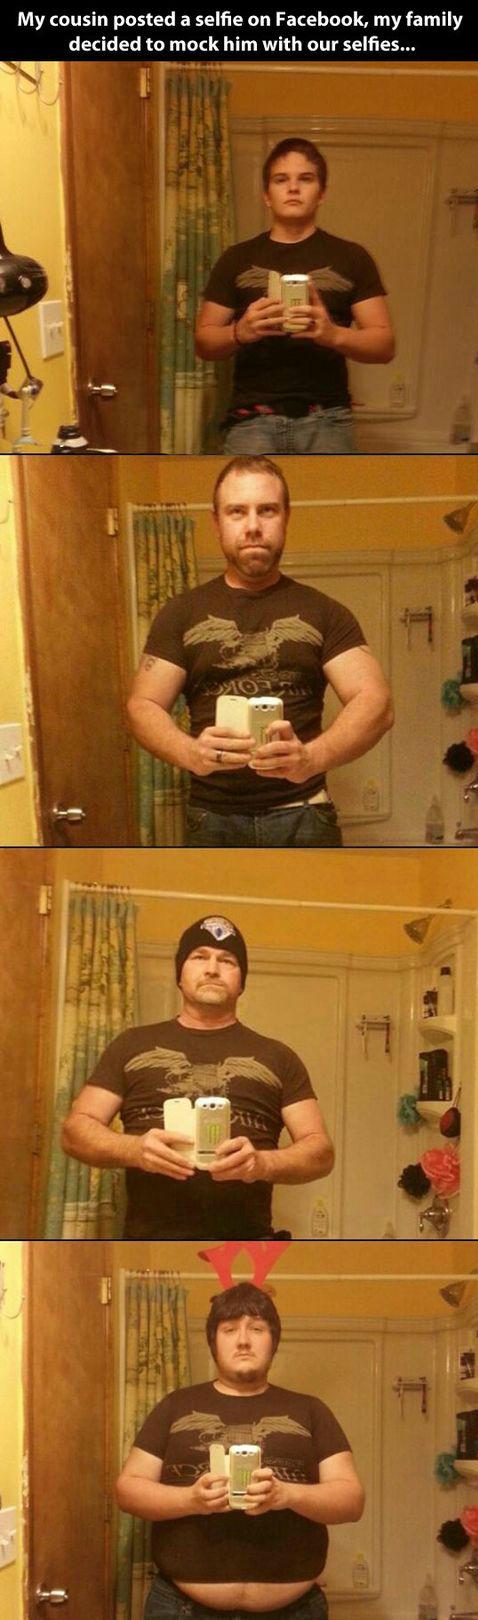 Don't do selfies, kids. . Don't do selfies kids